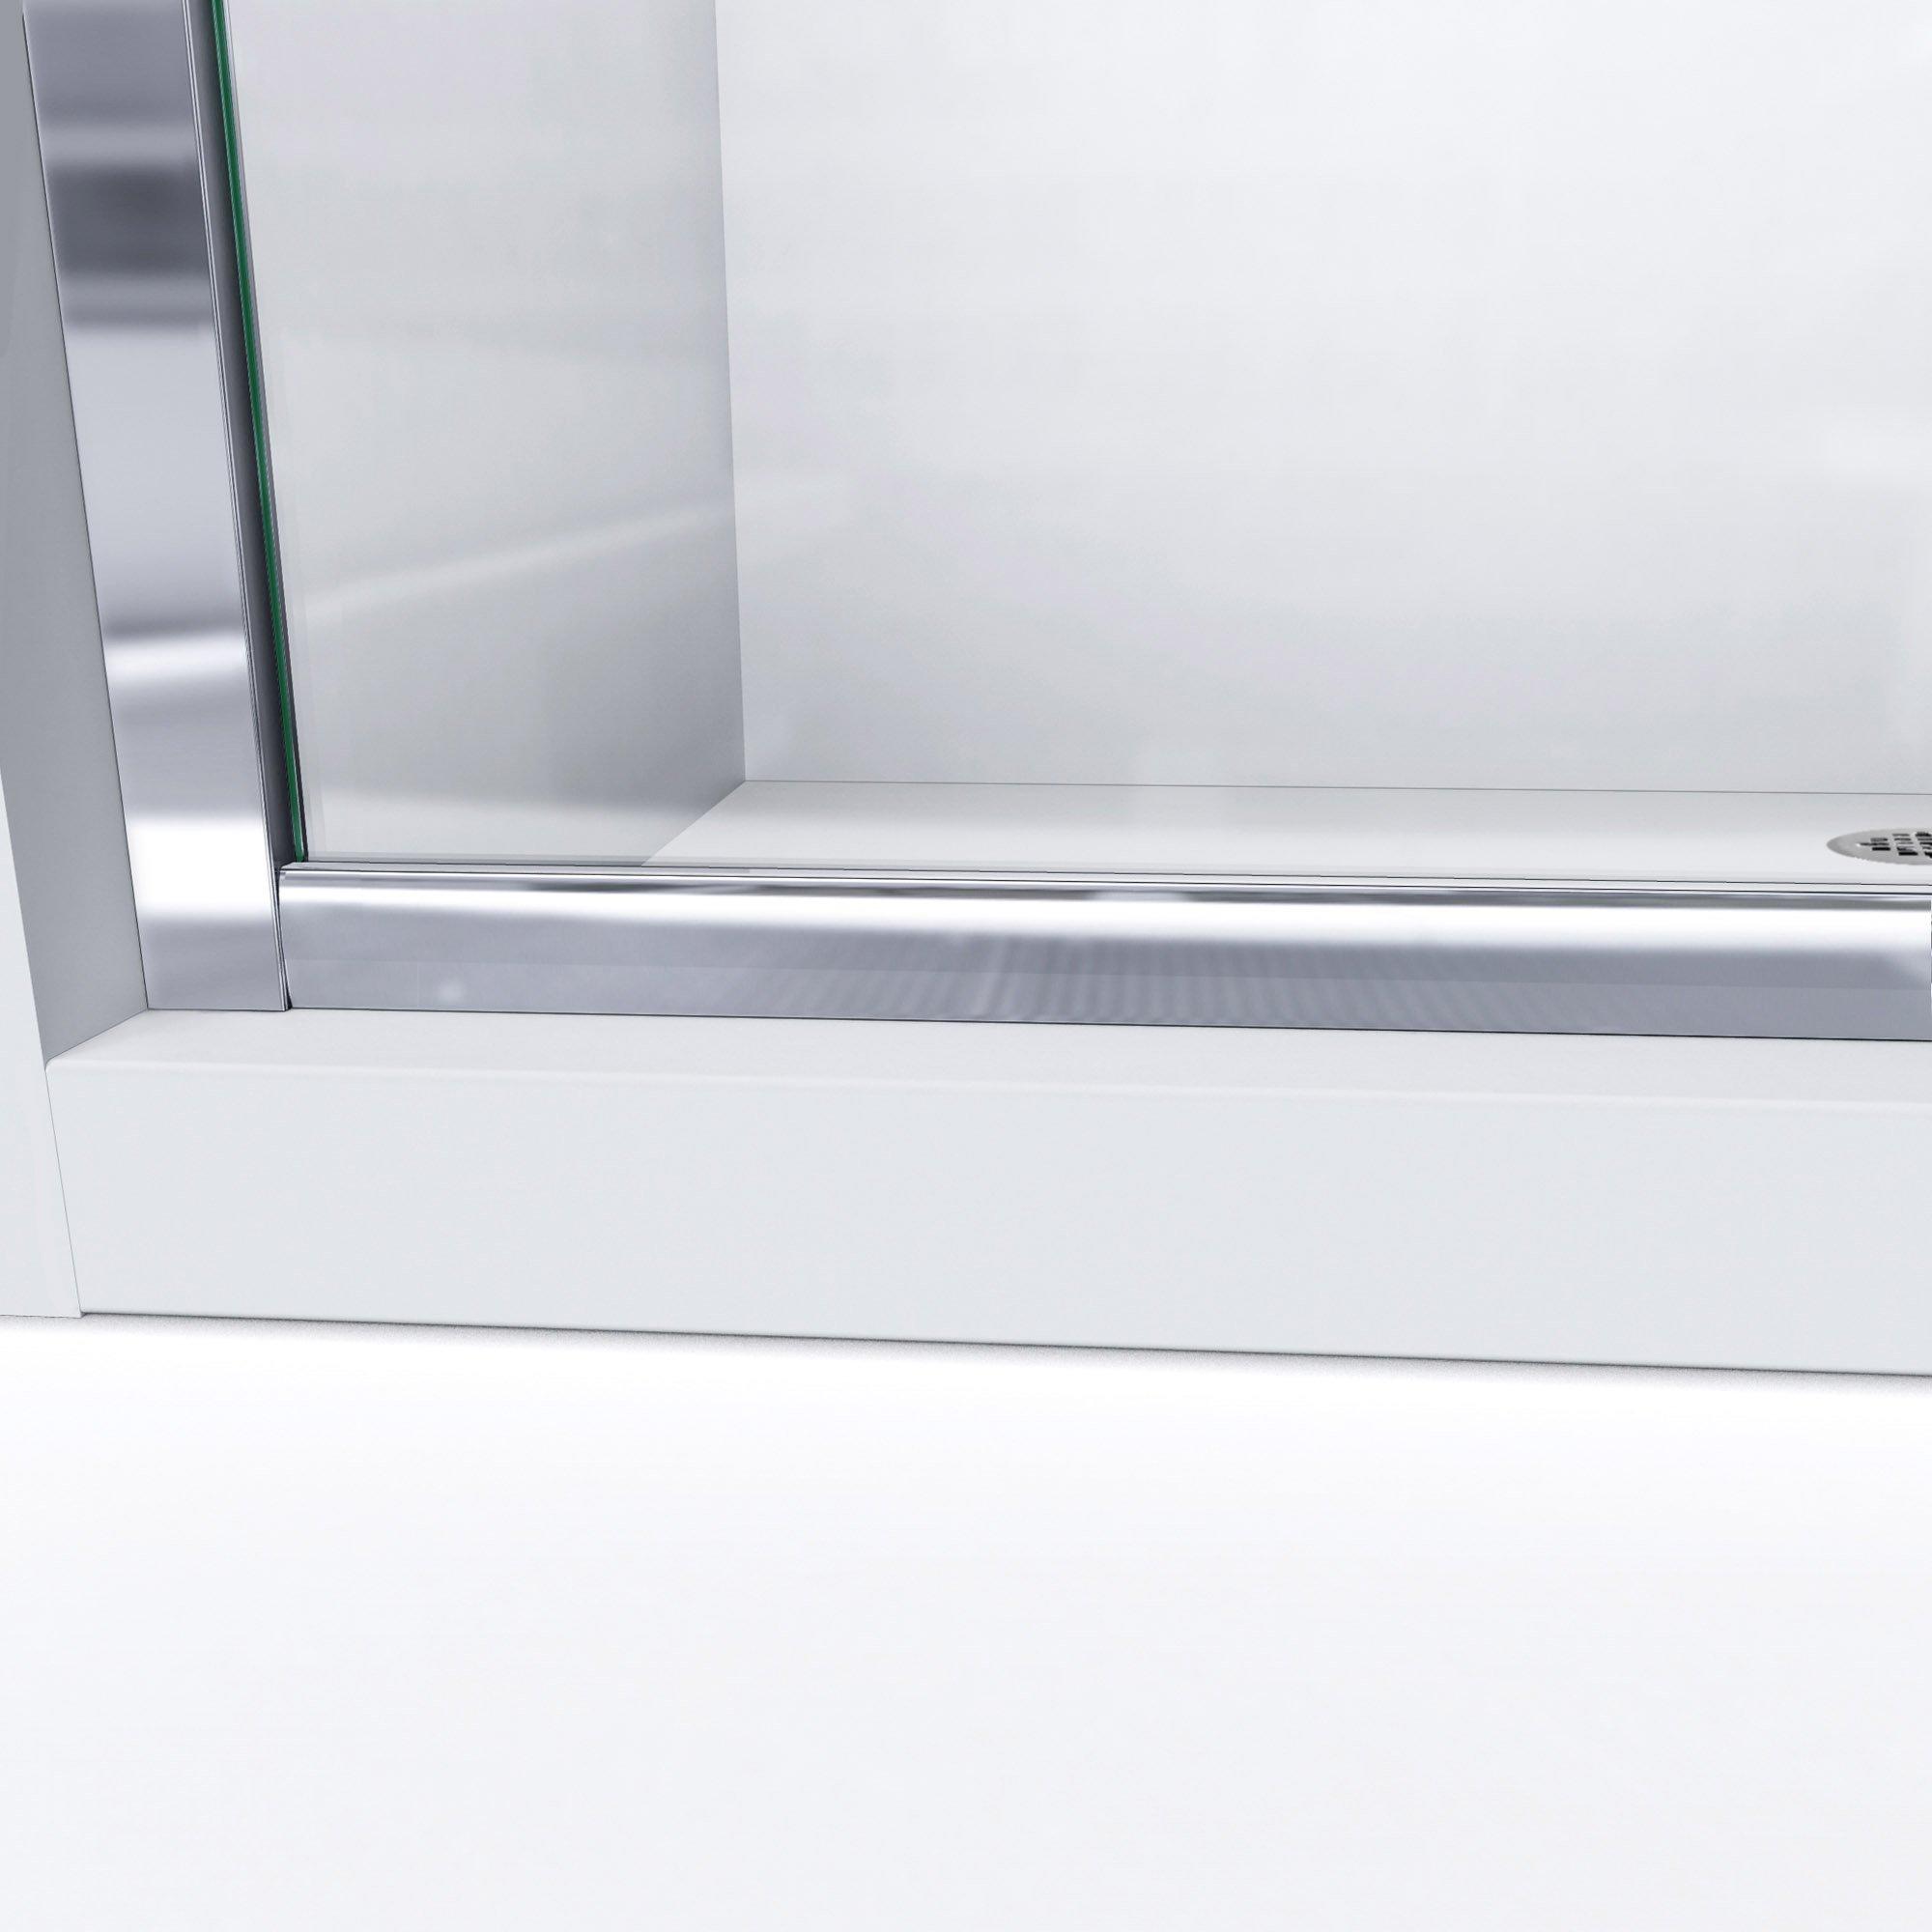 DreamLine Infinity-Z 50-54 in. W x 72 in. H Semi-Frameless Sliding Shower Door, Clear Glass in Brushed Nickel, SHDR-0954720-04 by DreamLine (Image #7)